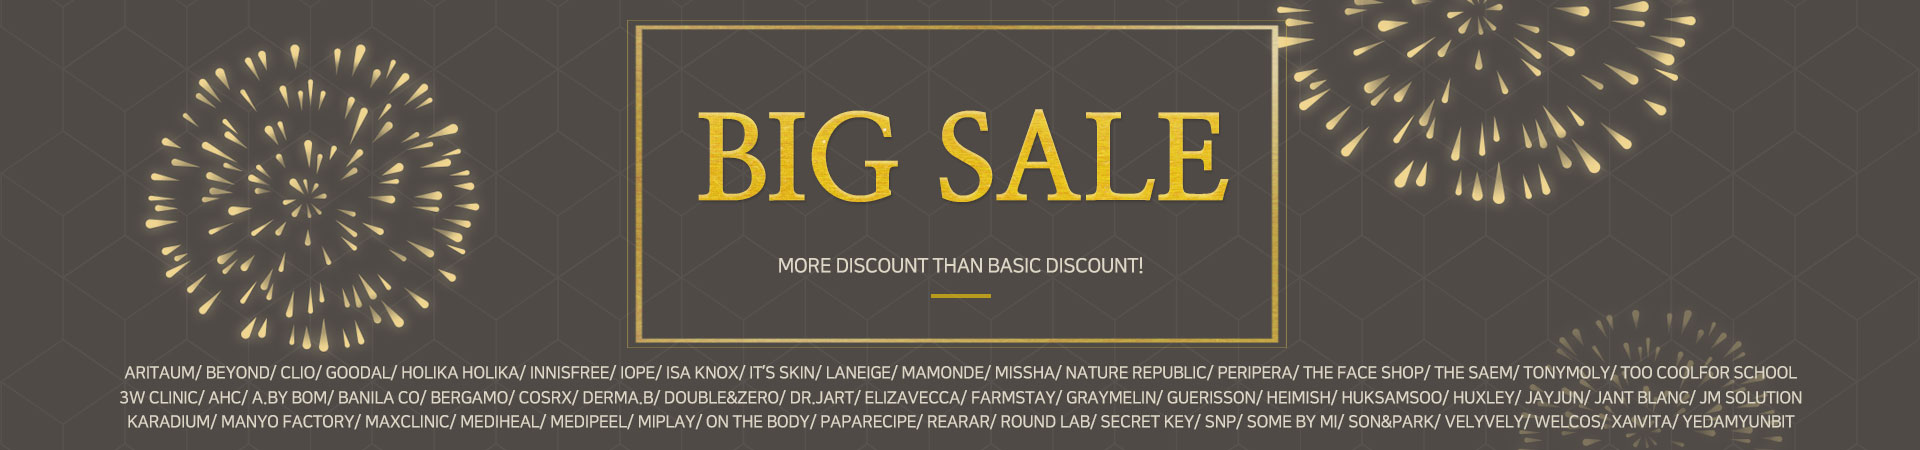 Big Sale 빅세일